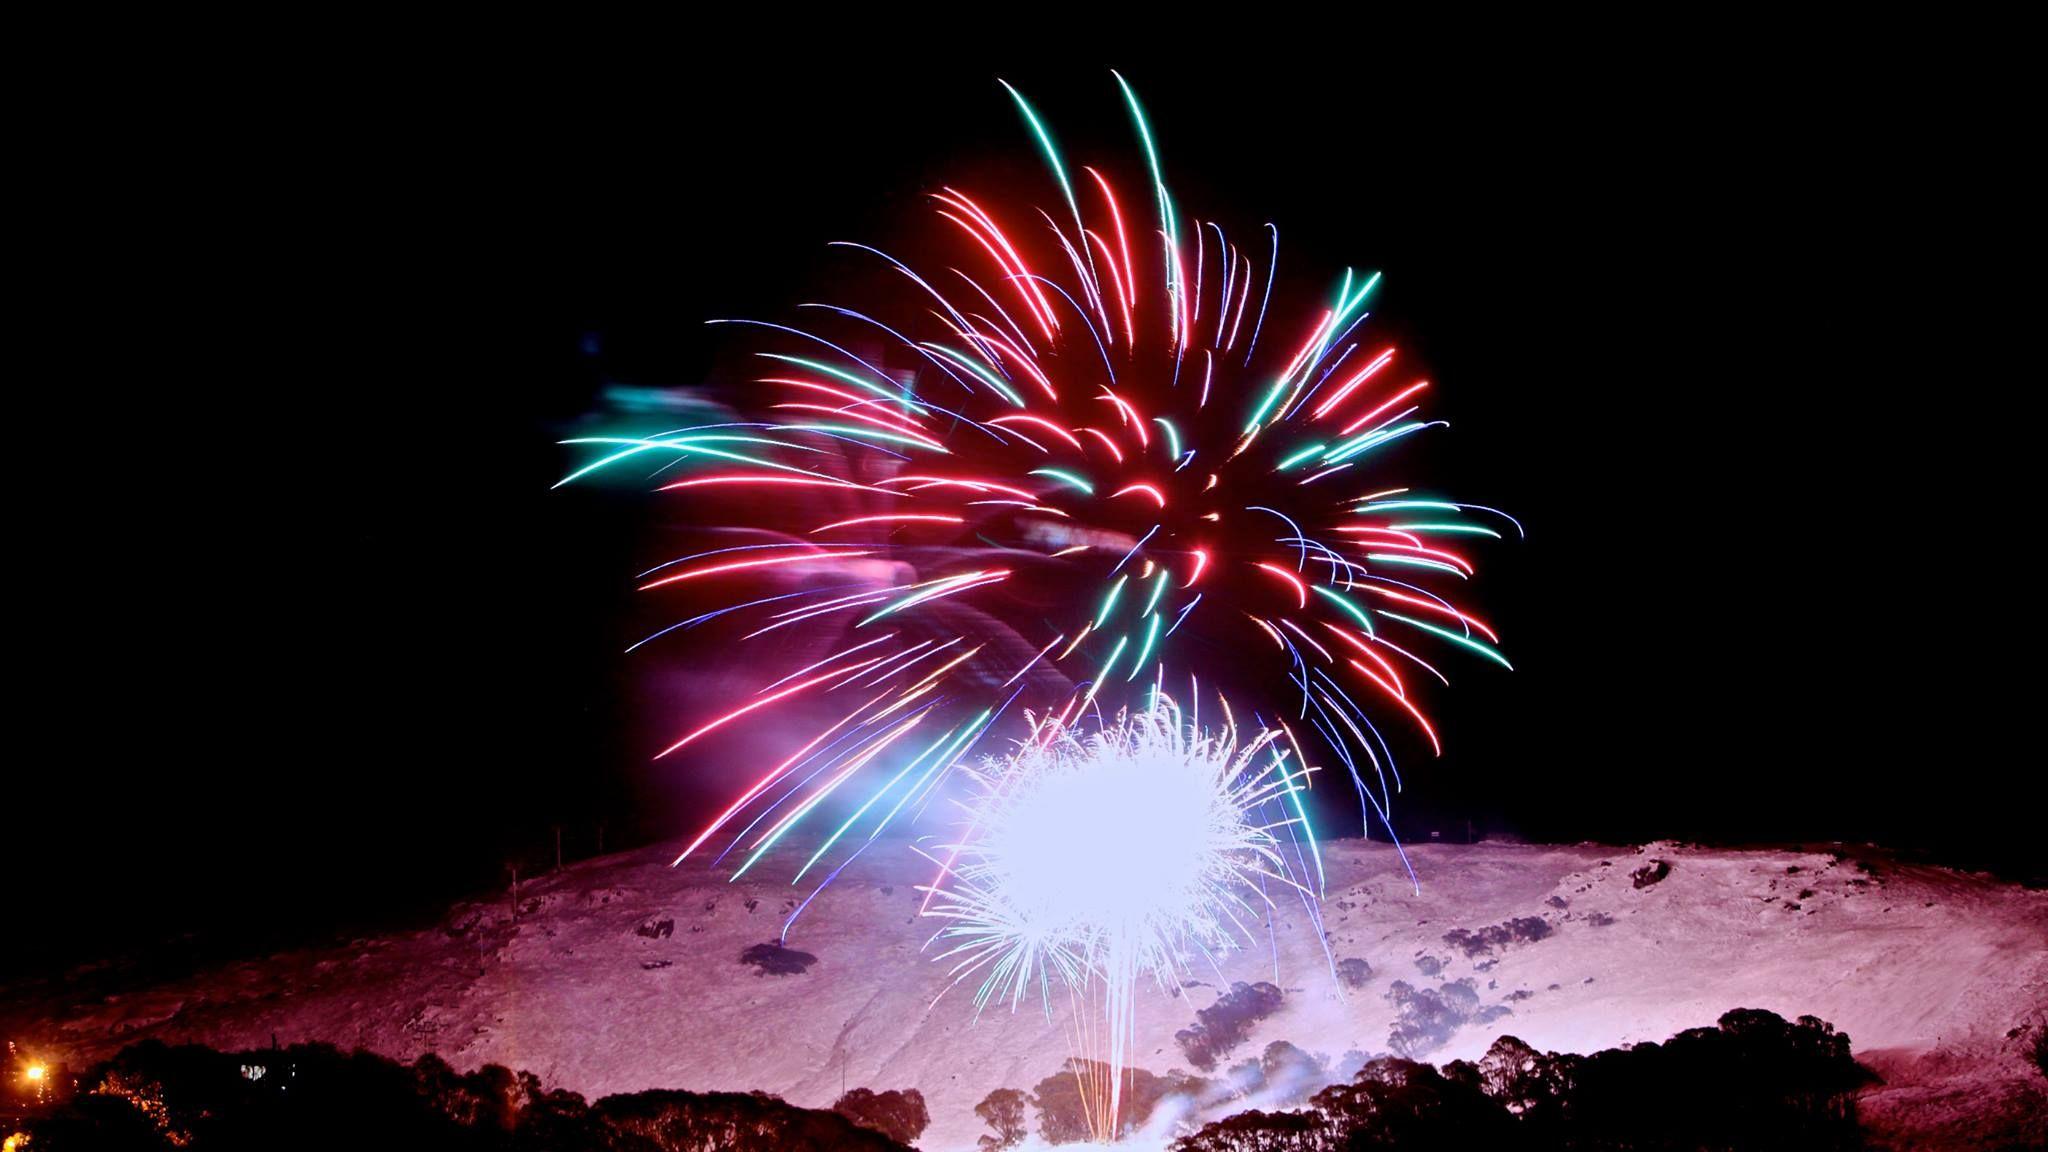 Fireworks in the night sky at Falls Creek snow resort in Victoria, Australia #snowaus